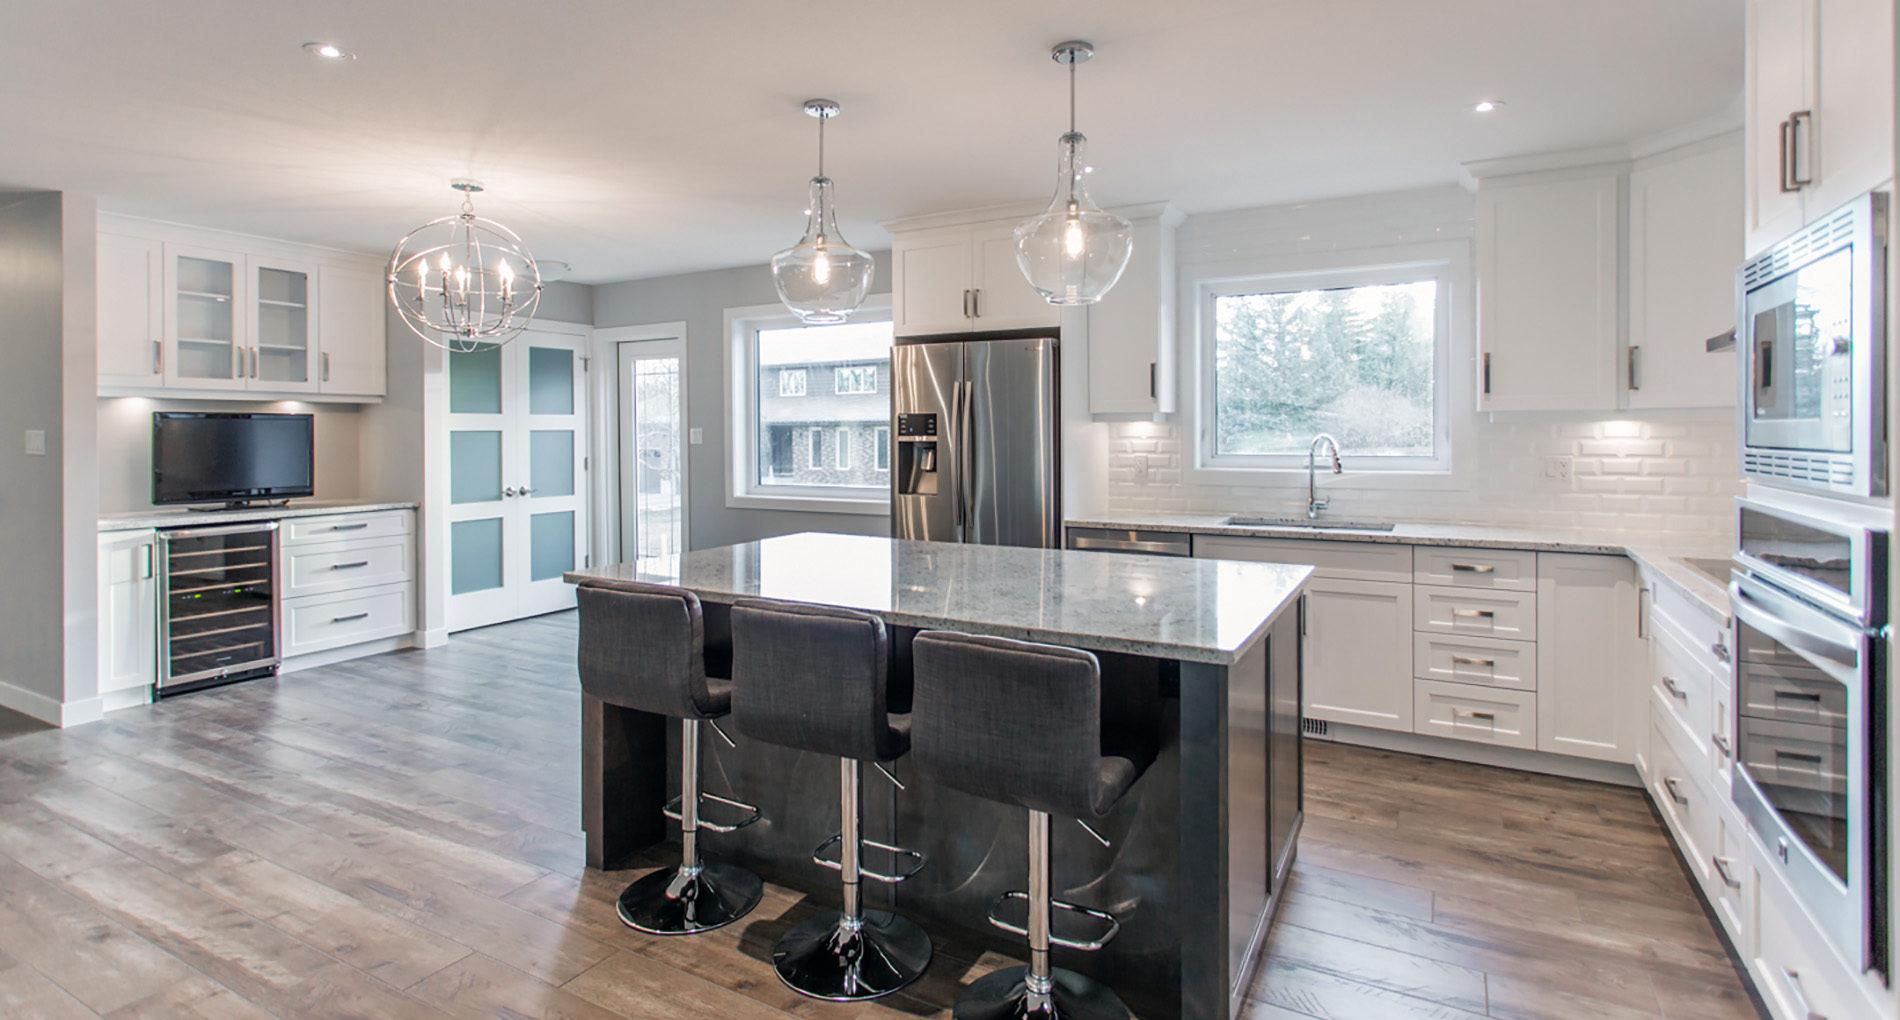 Kitchen Renovation Saskatoon Windsorplace Slider